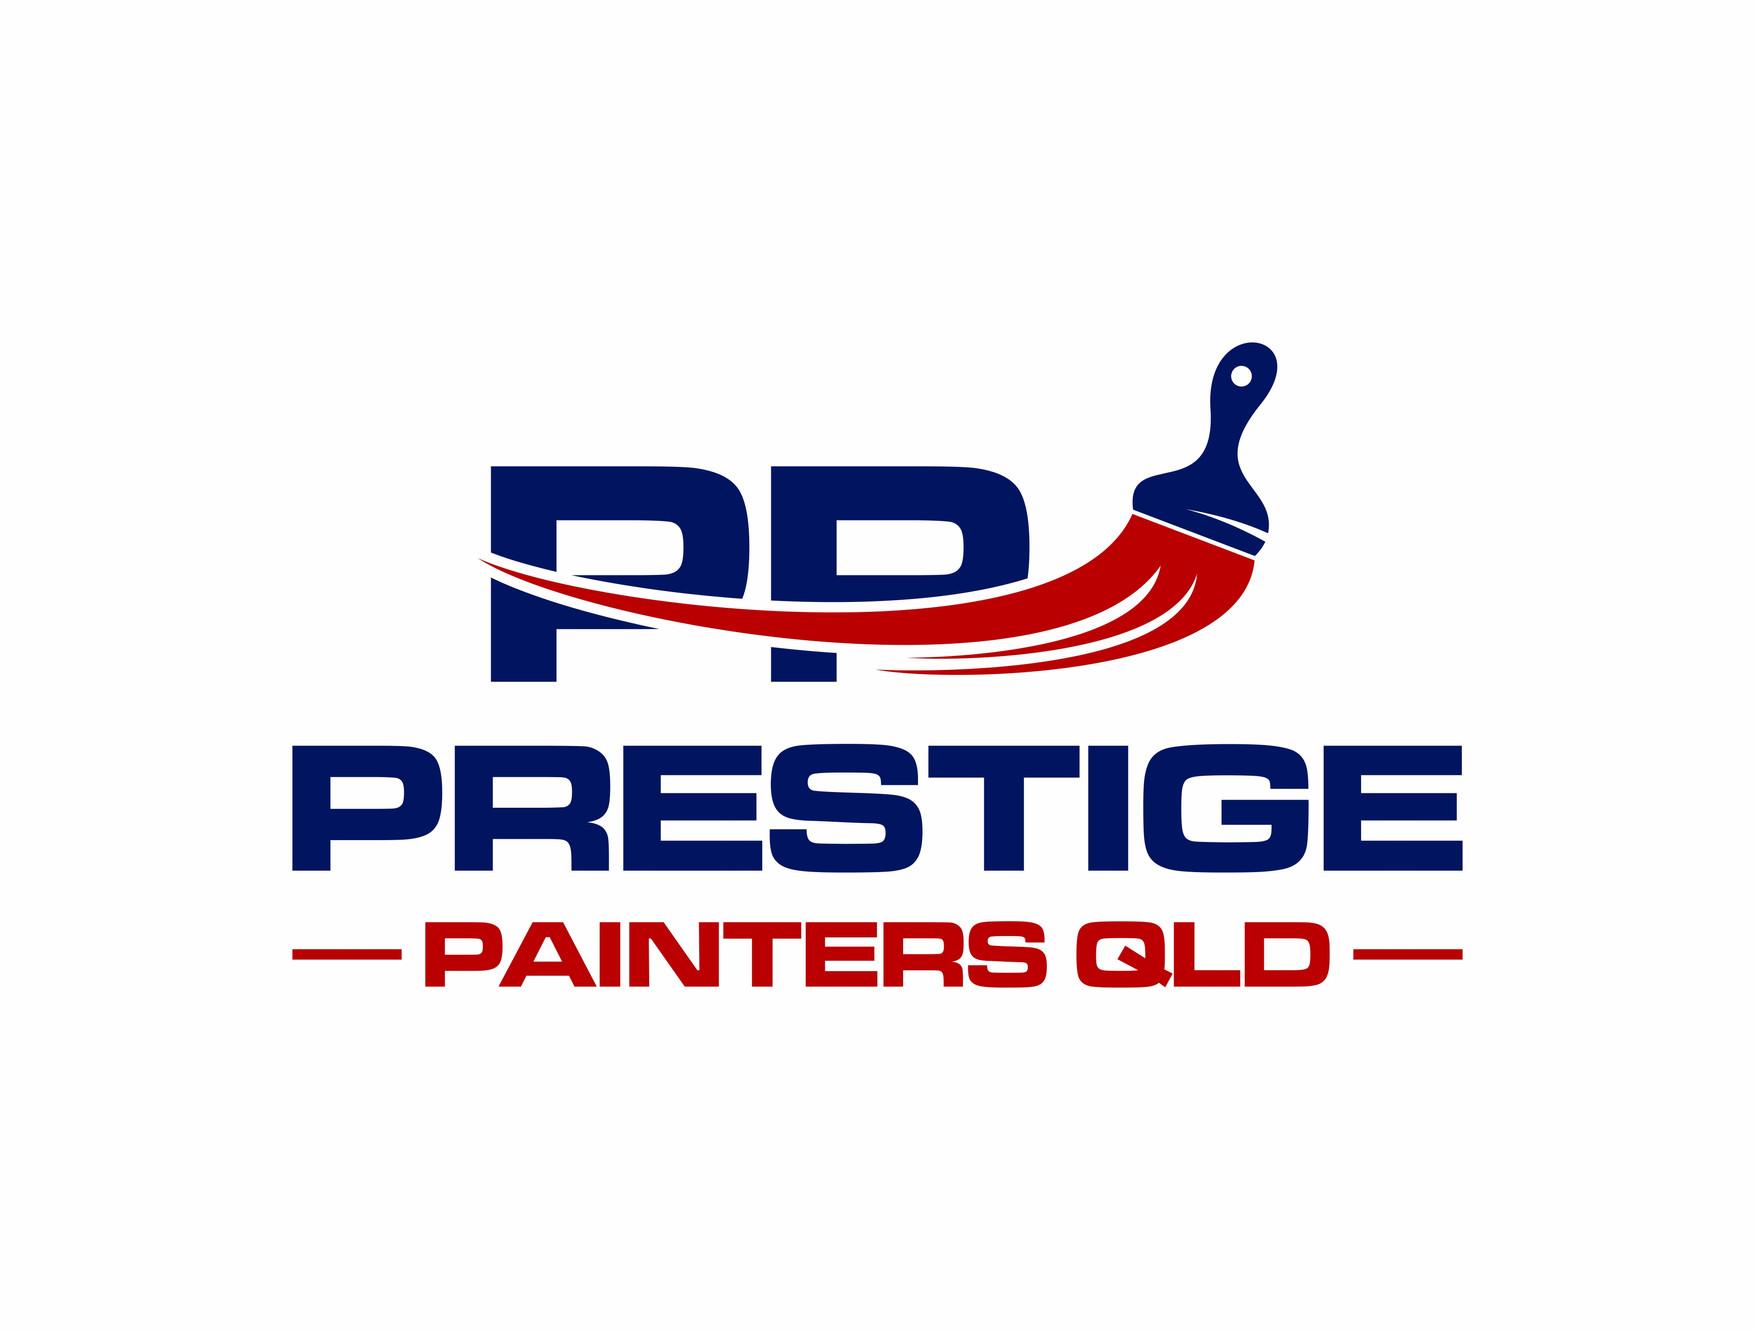 Prestige Painters QLD - Brisbane - HOME